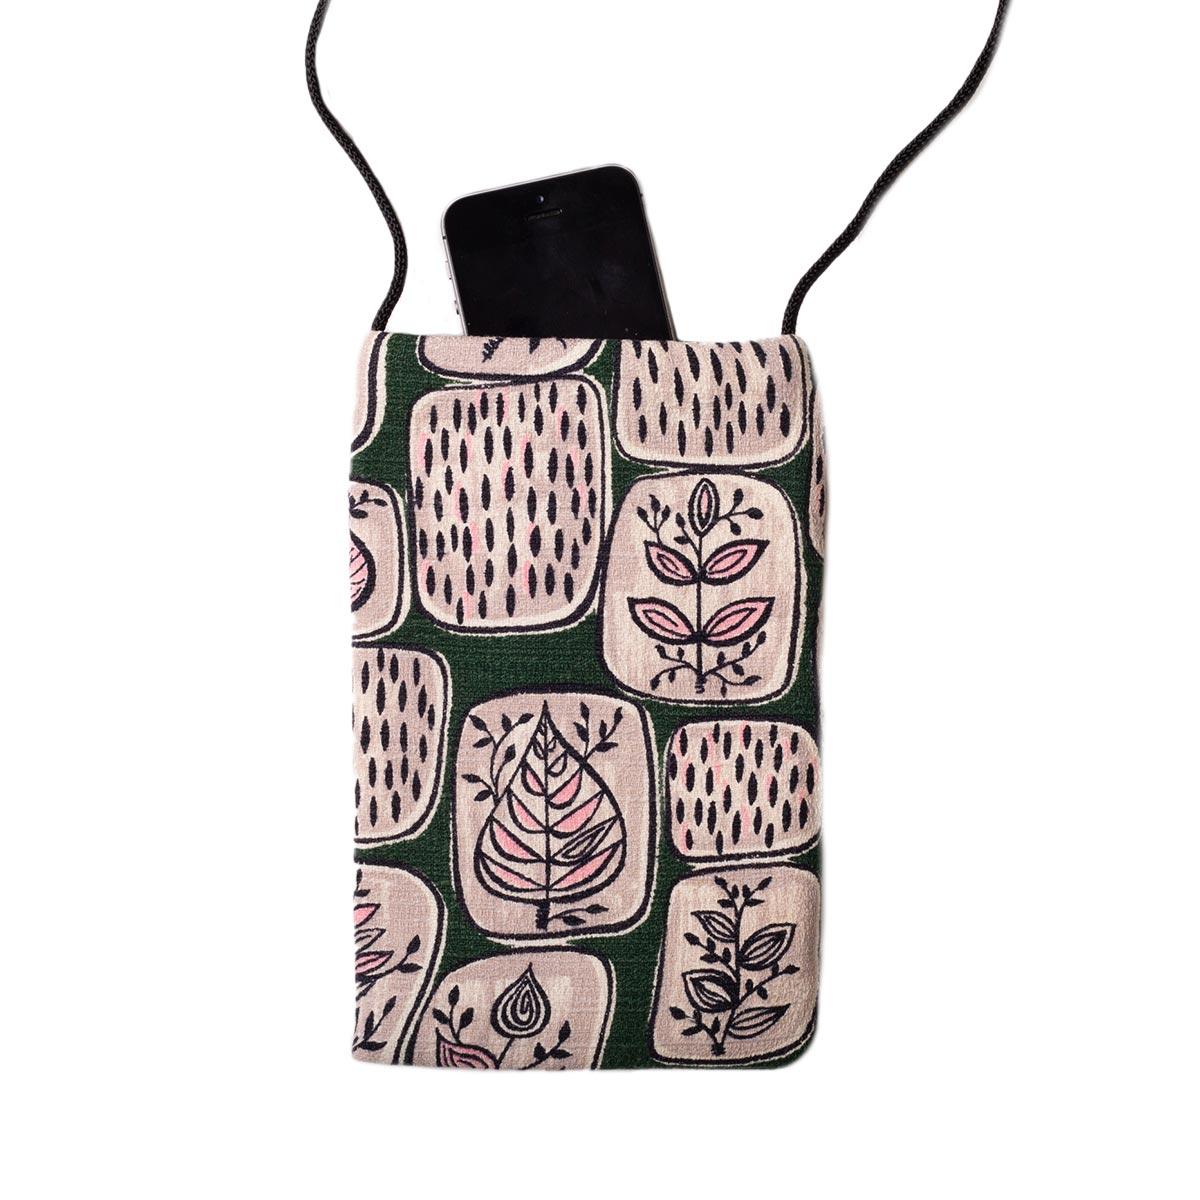 cellphone bag Abstract Botanical Motif